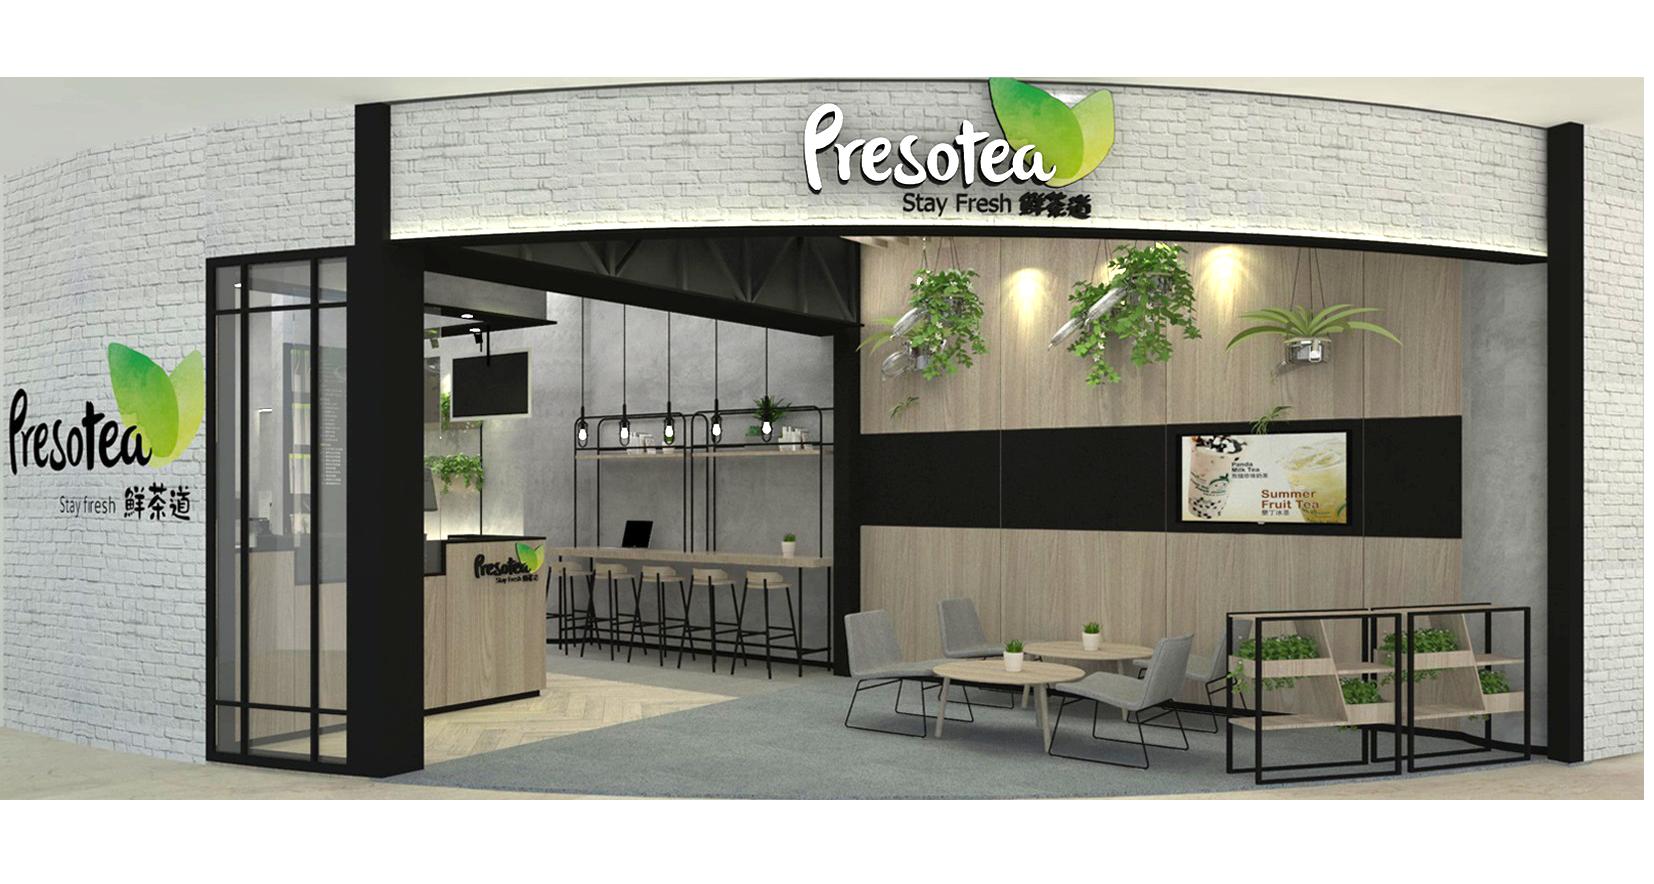 Quebec Presotea Franchise Store